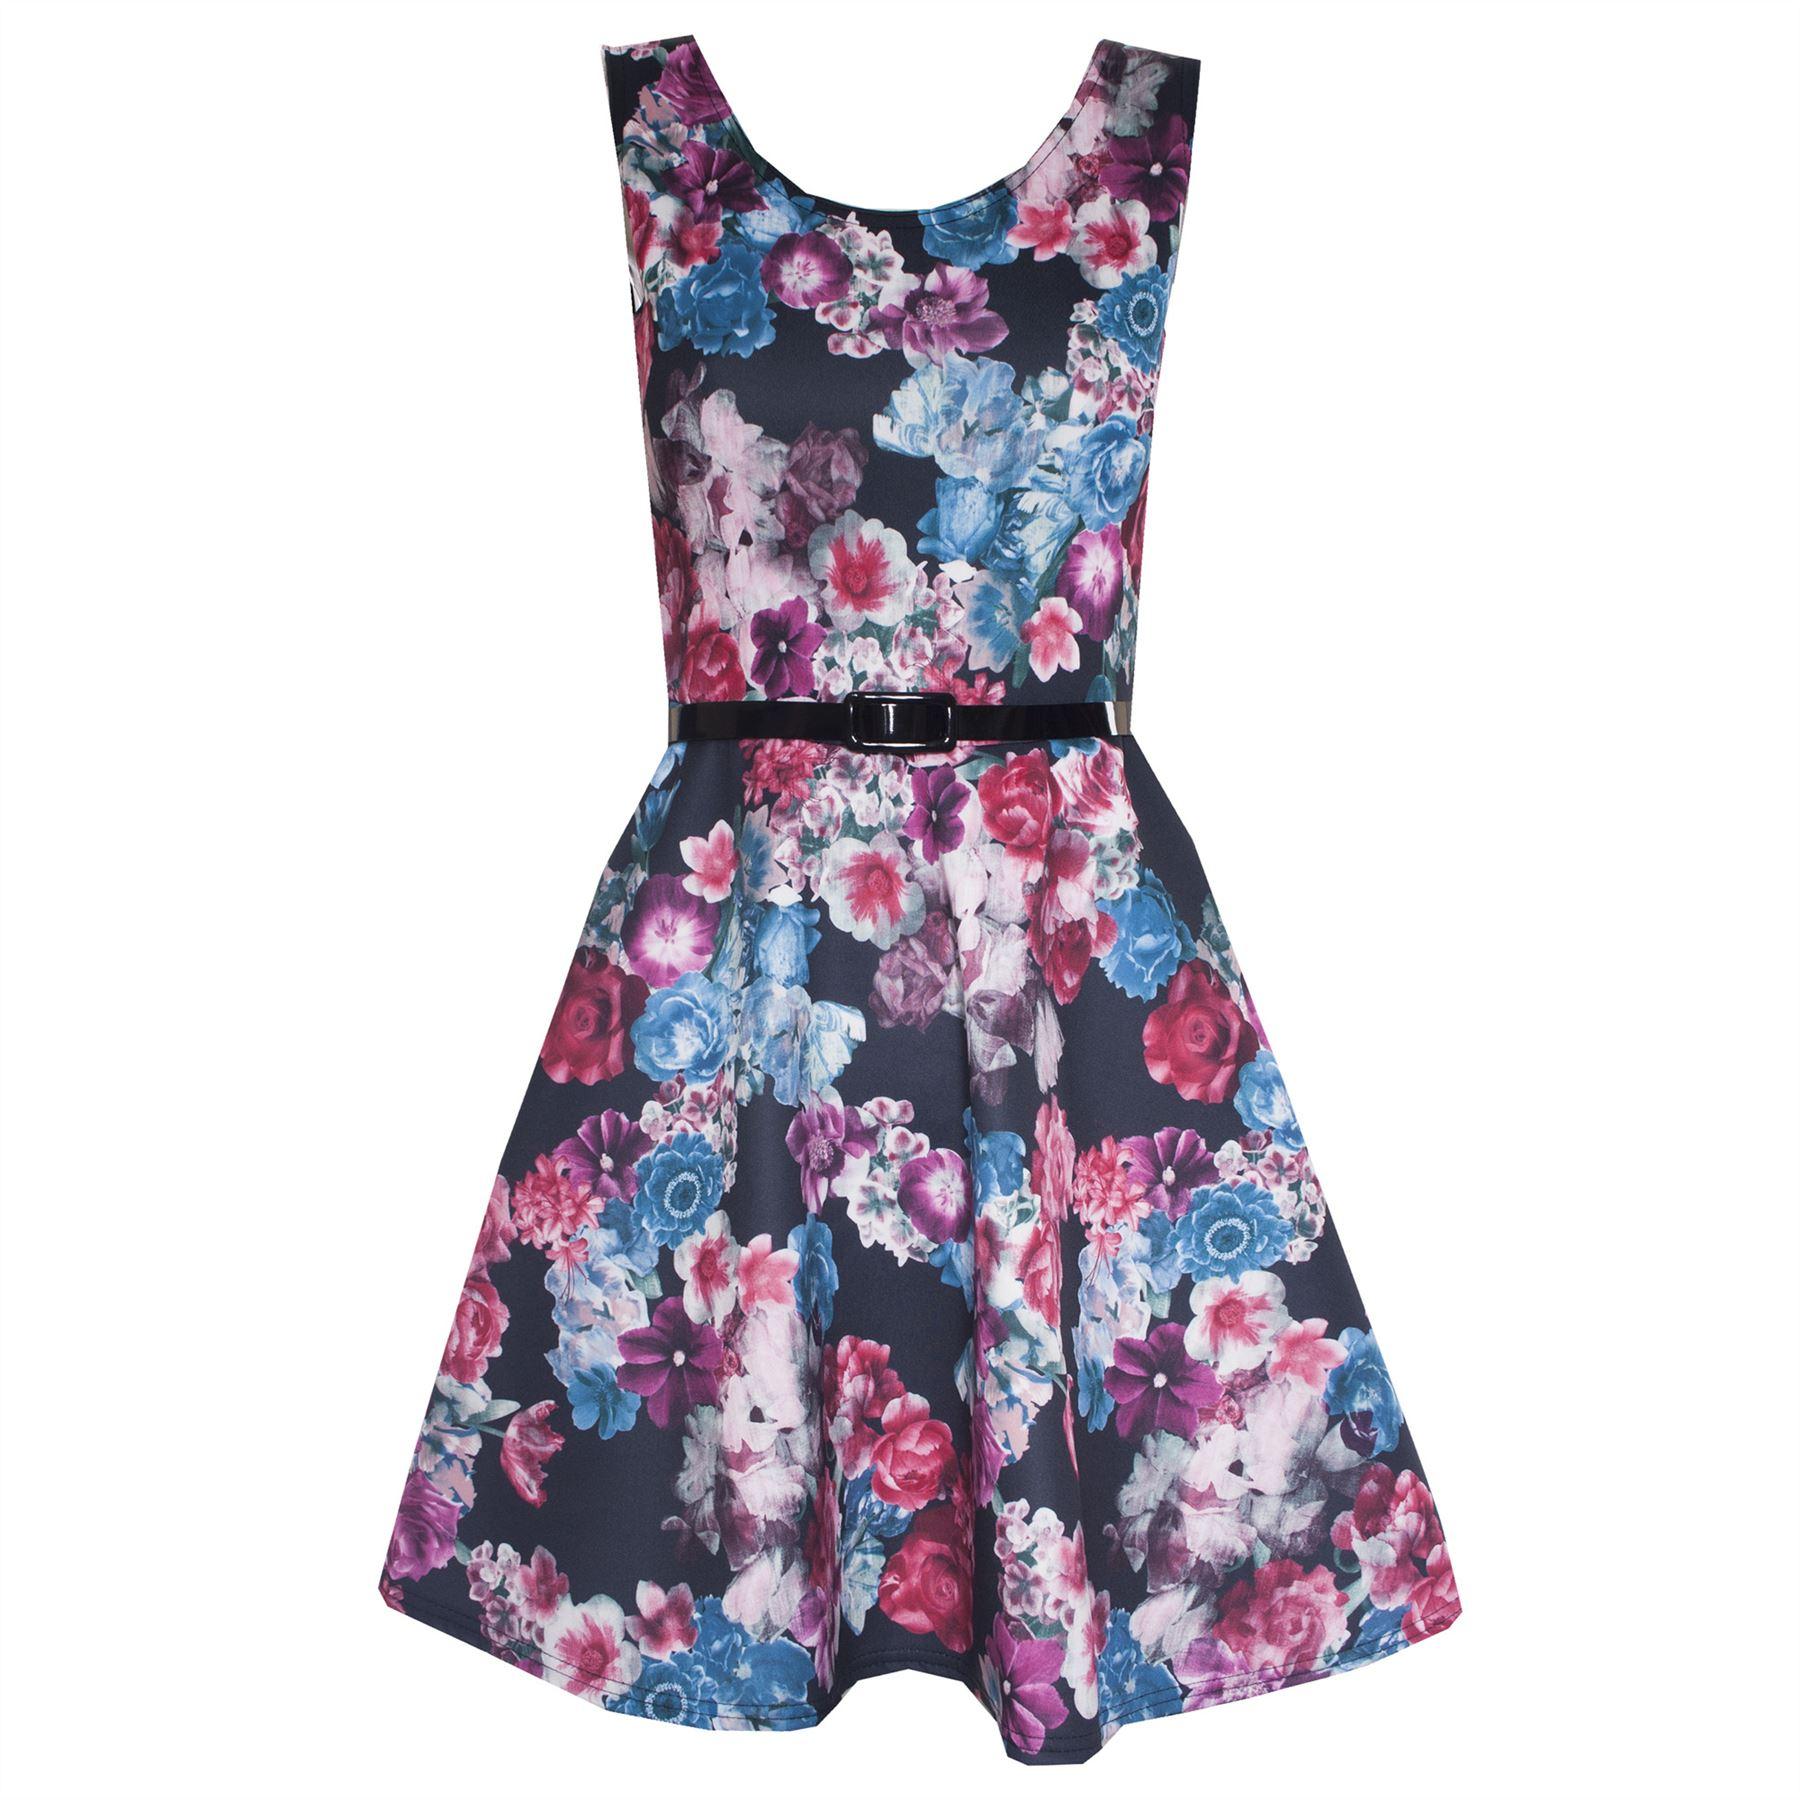 new womens floral frill midi bodycon skirt pencil